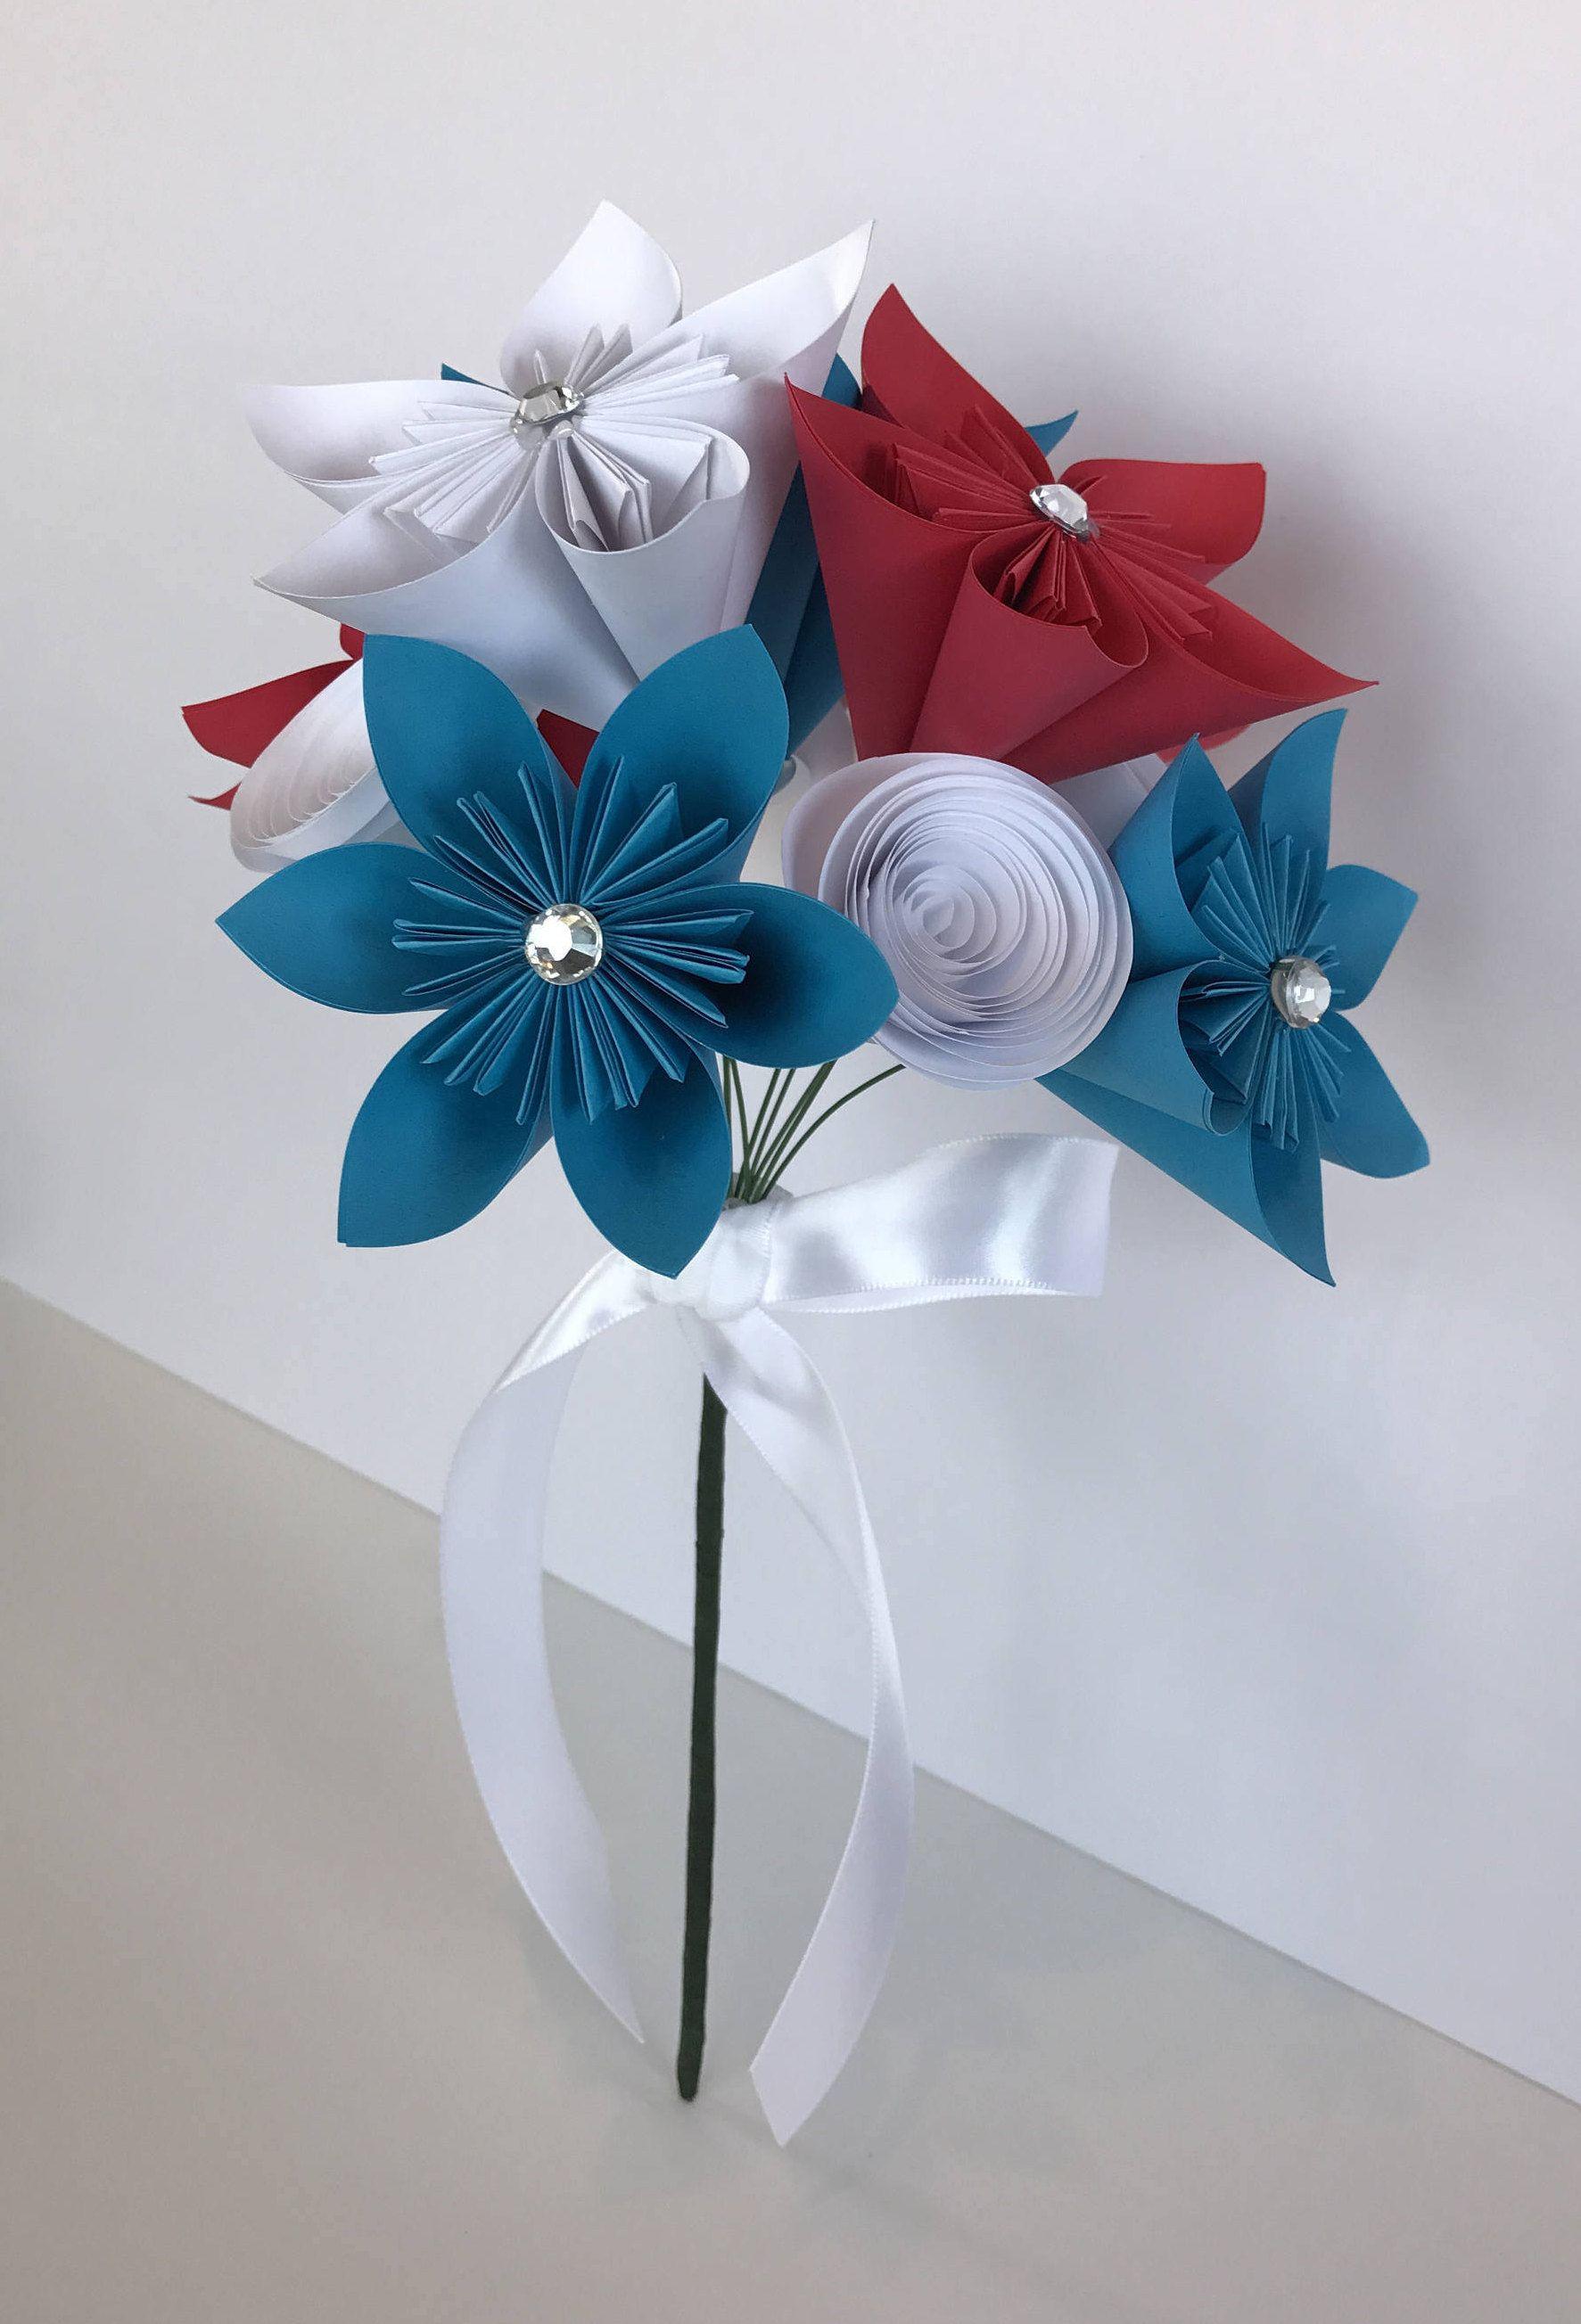 Medium Patriotic Origami Flower Bouquet/Red/White/Blue/Centerpiece ...